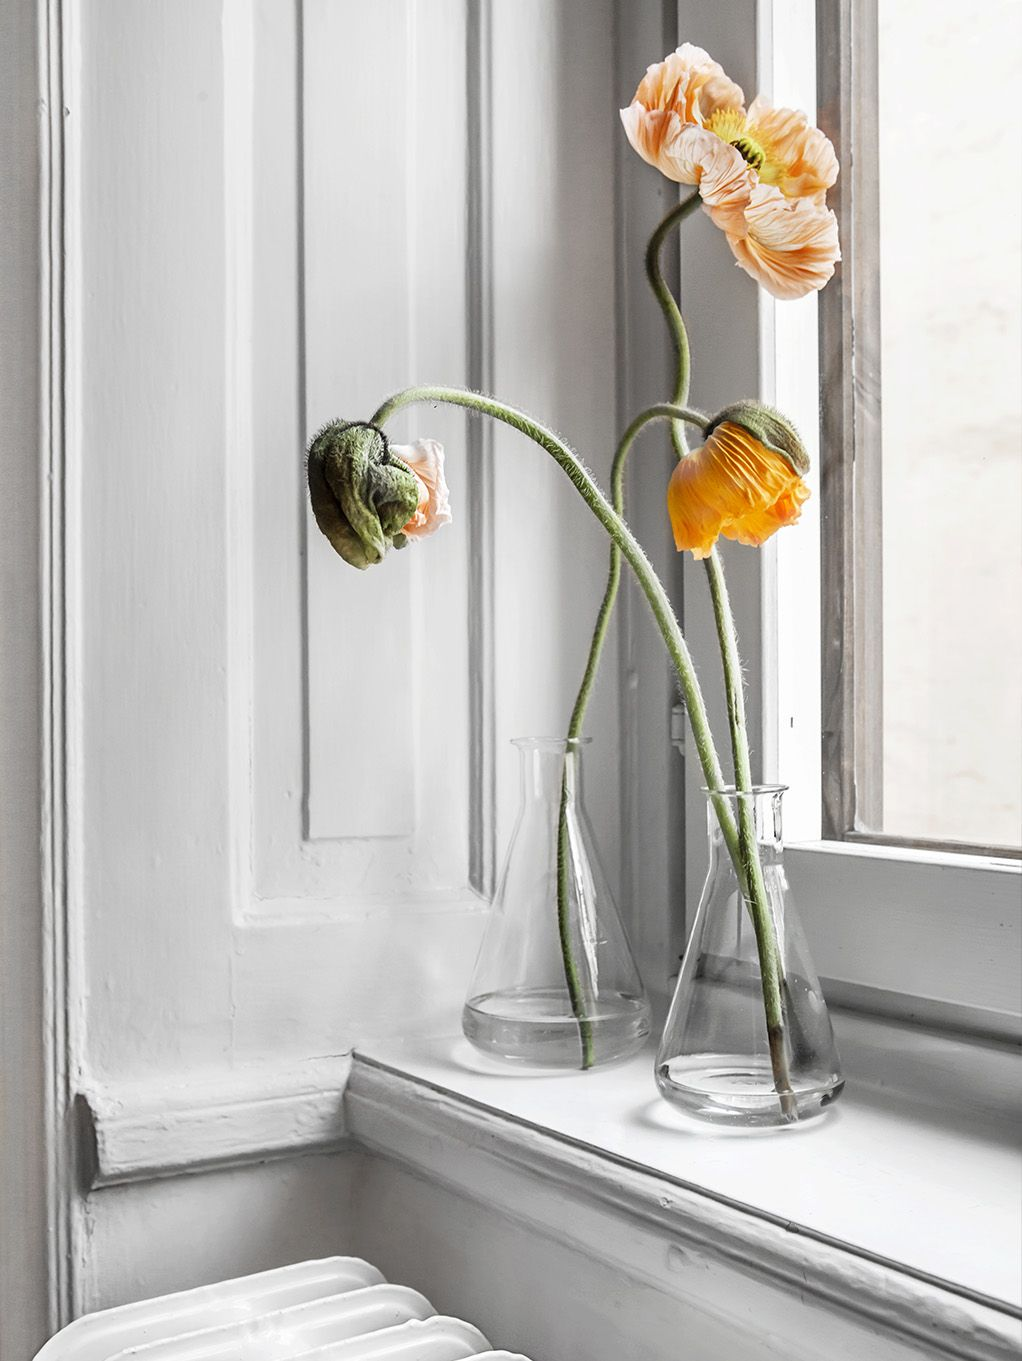 Stylisten emma wallméns söderlya alcro trend flowers